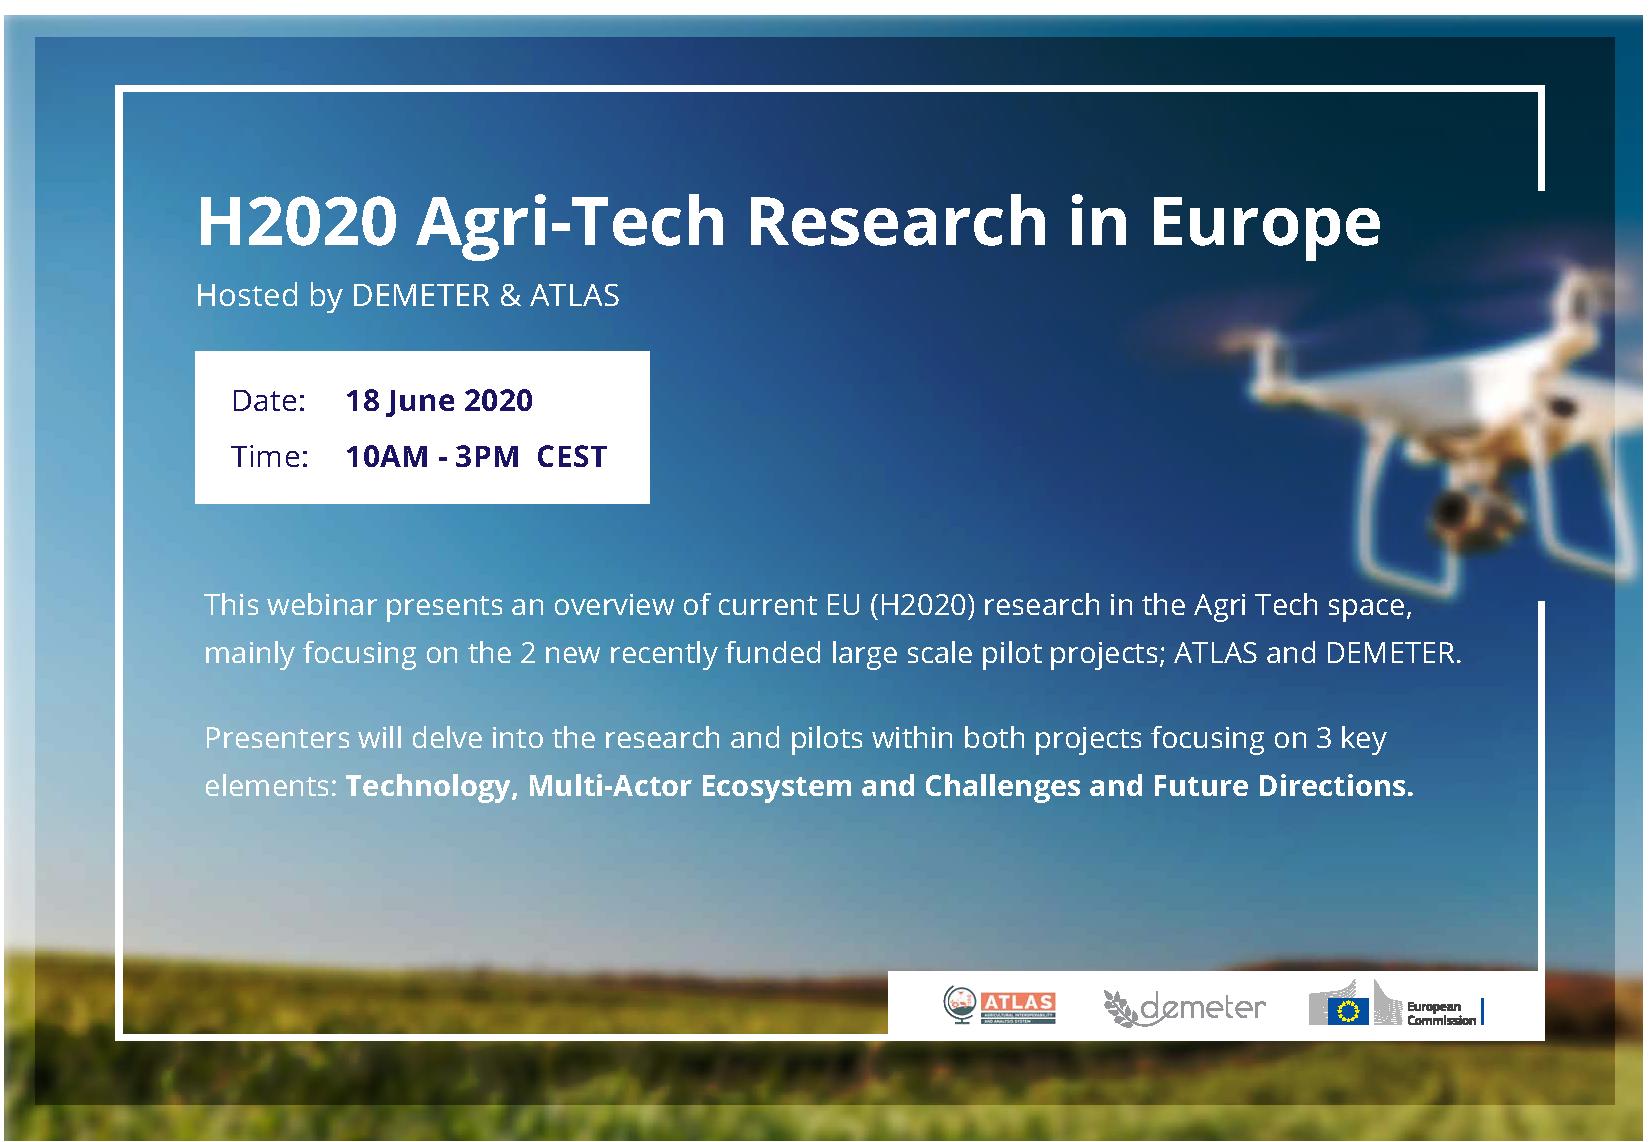 'H2020 Agri-Tech Research in Europe' webinar hosted by DEMETER & ATLAS